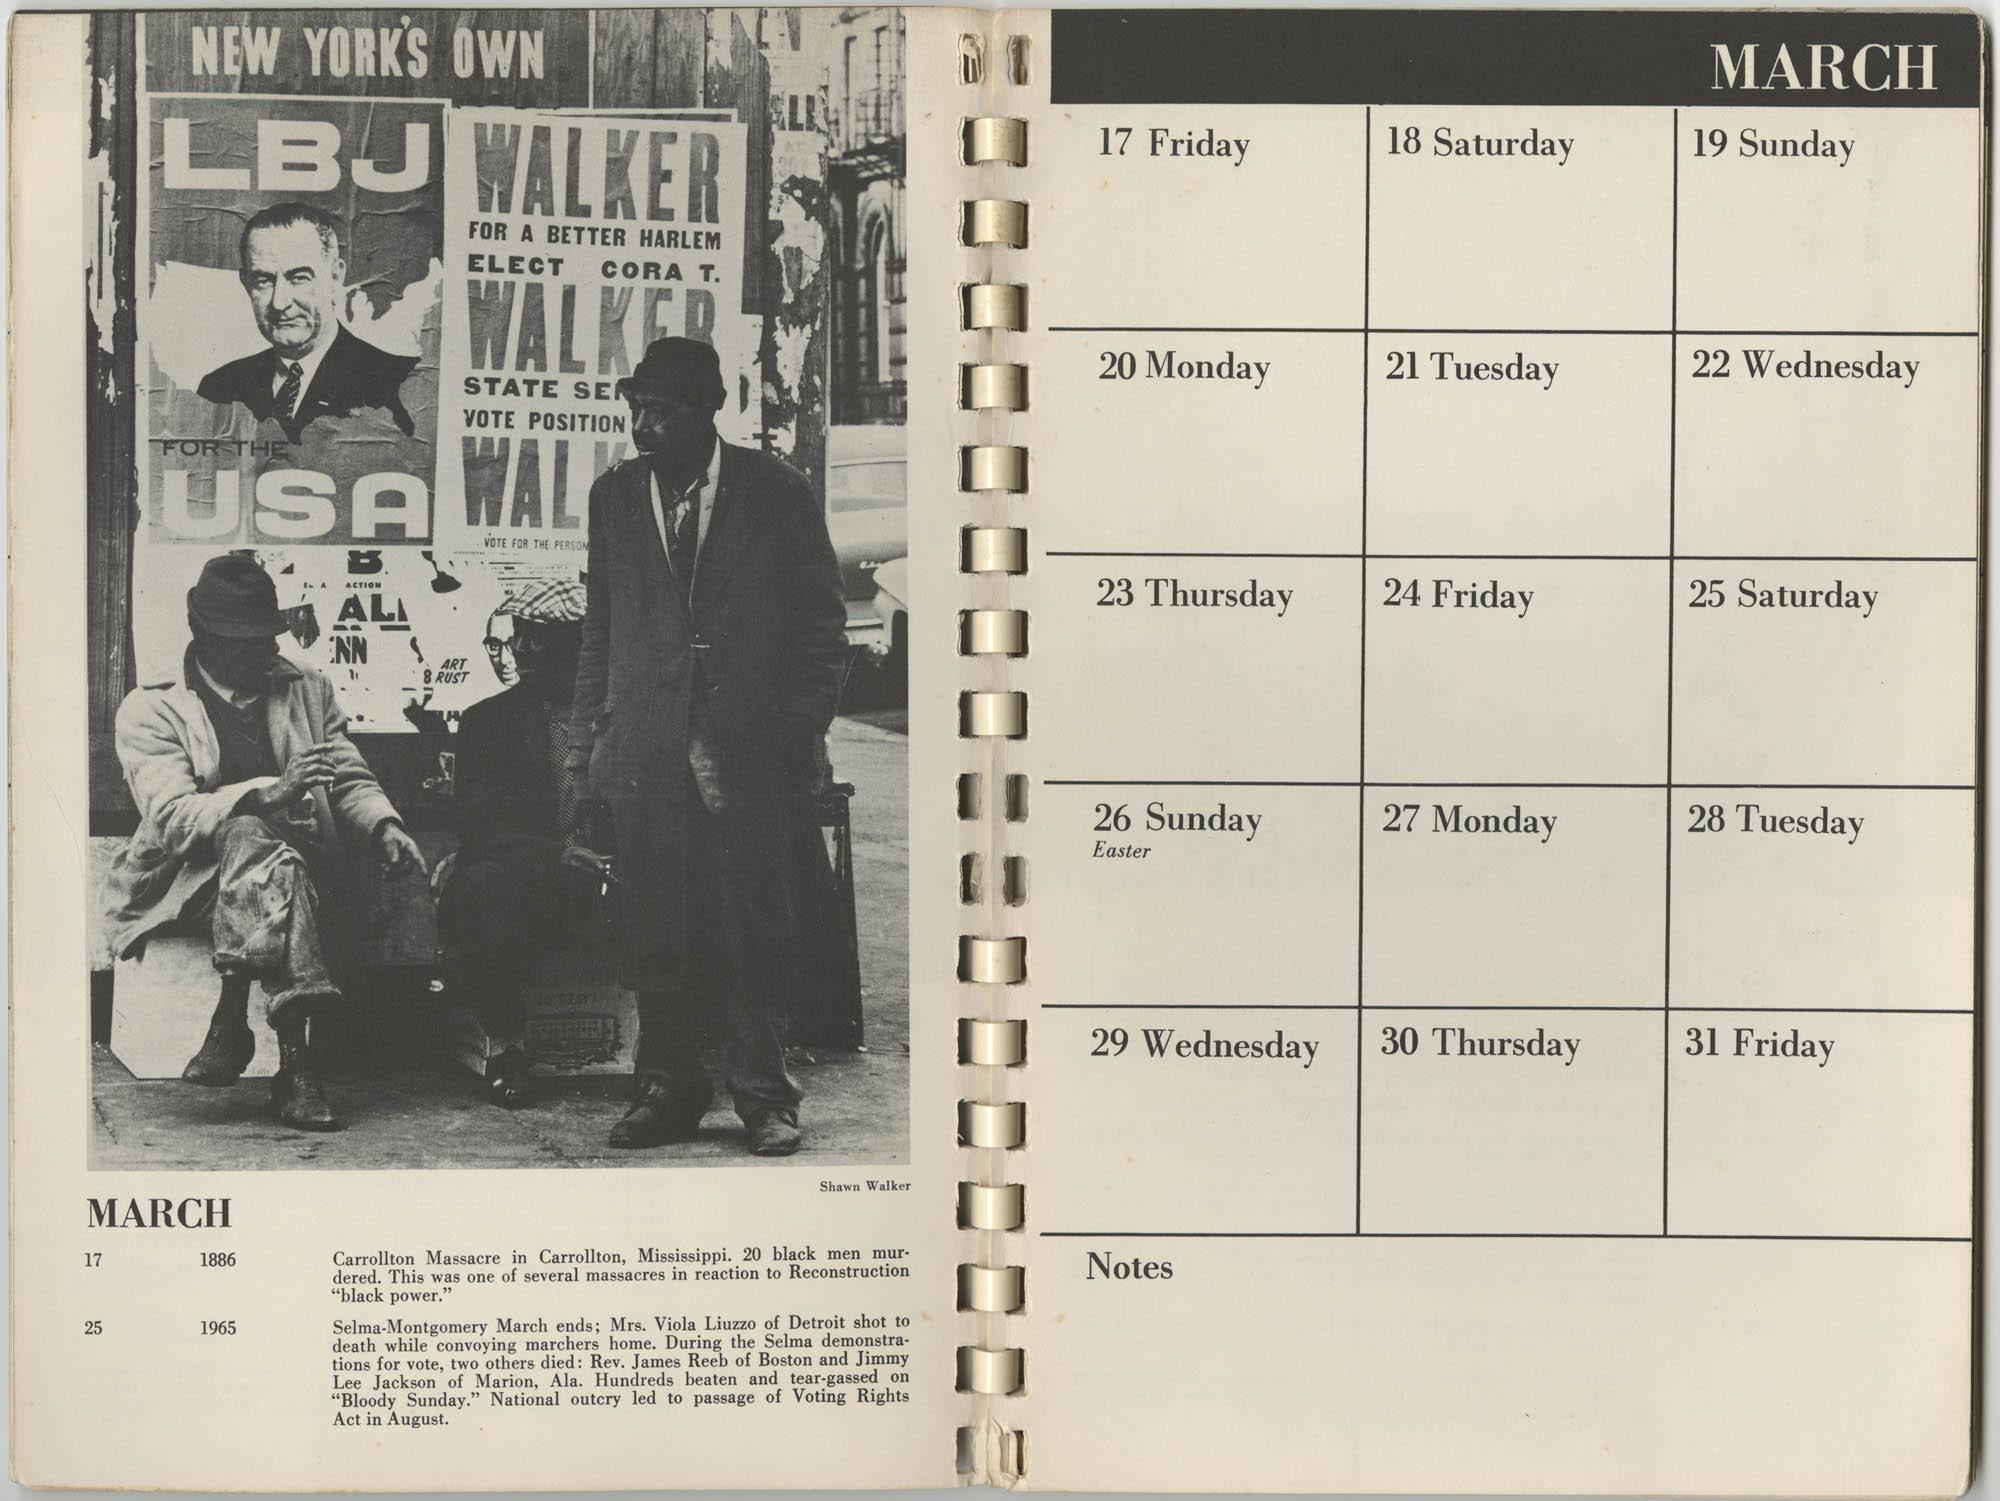 1967 SNCC Calendar, March 17-31